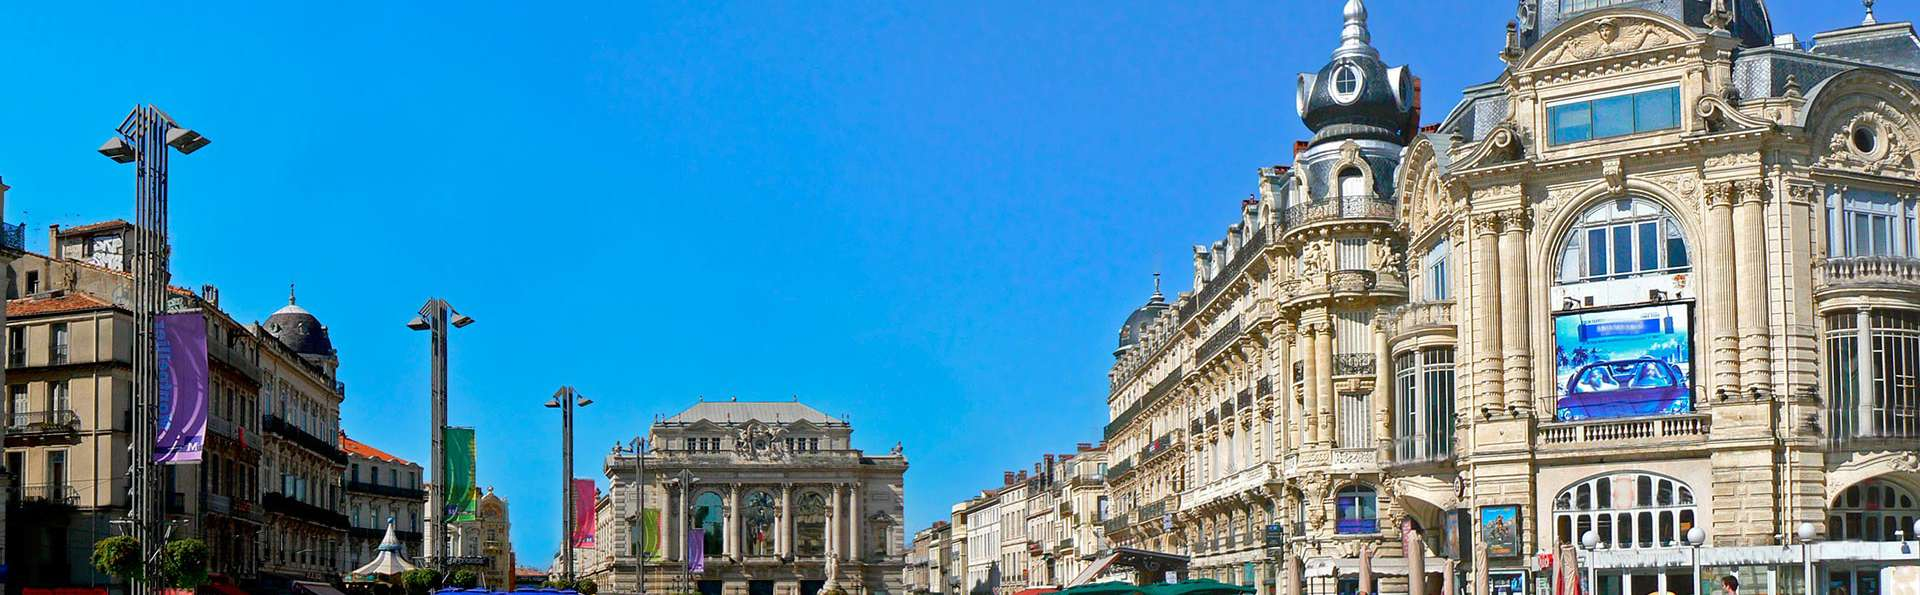 Grand Hôtel du Midi Montpellier - Opéra Comédie - edit_montpellier2.jpg